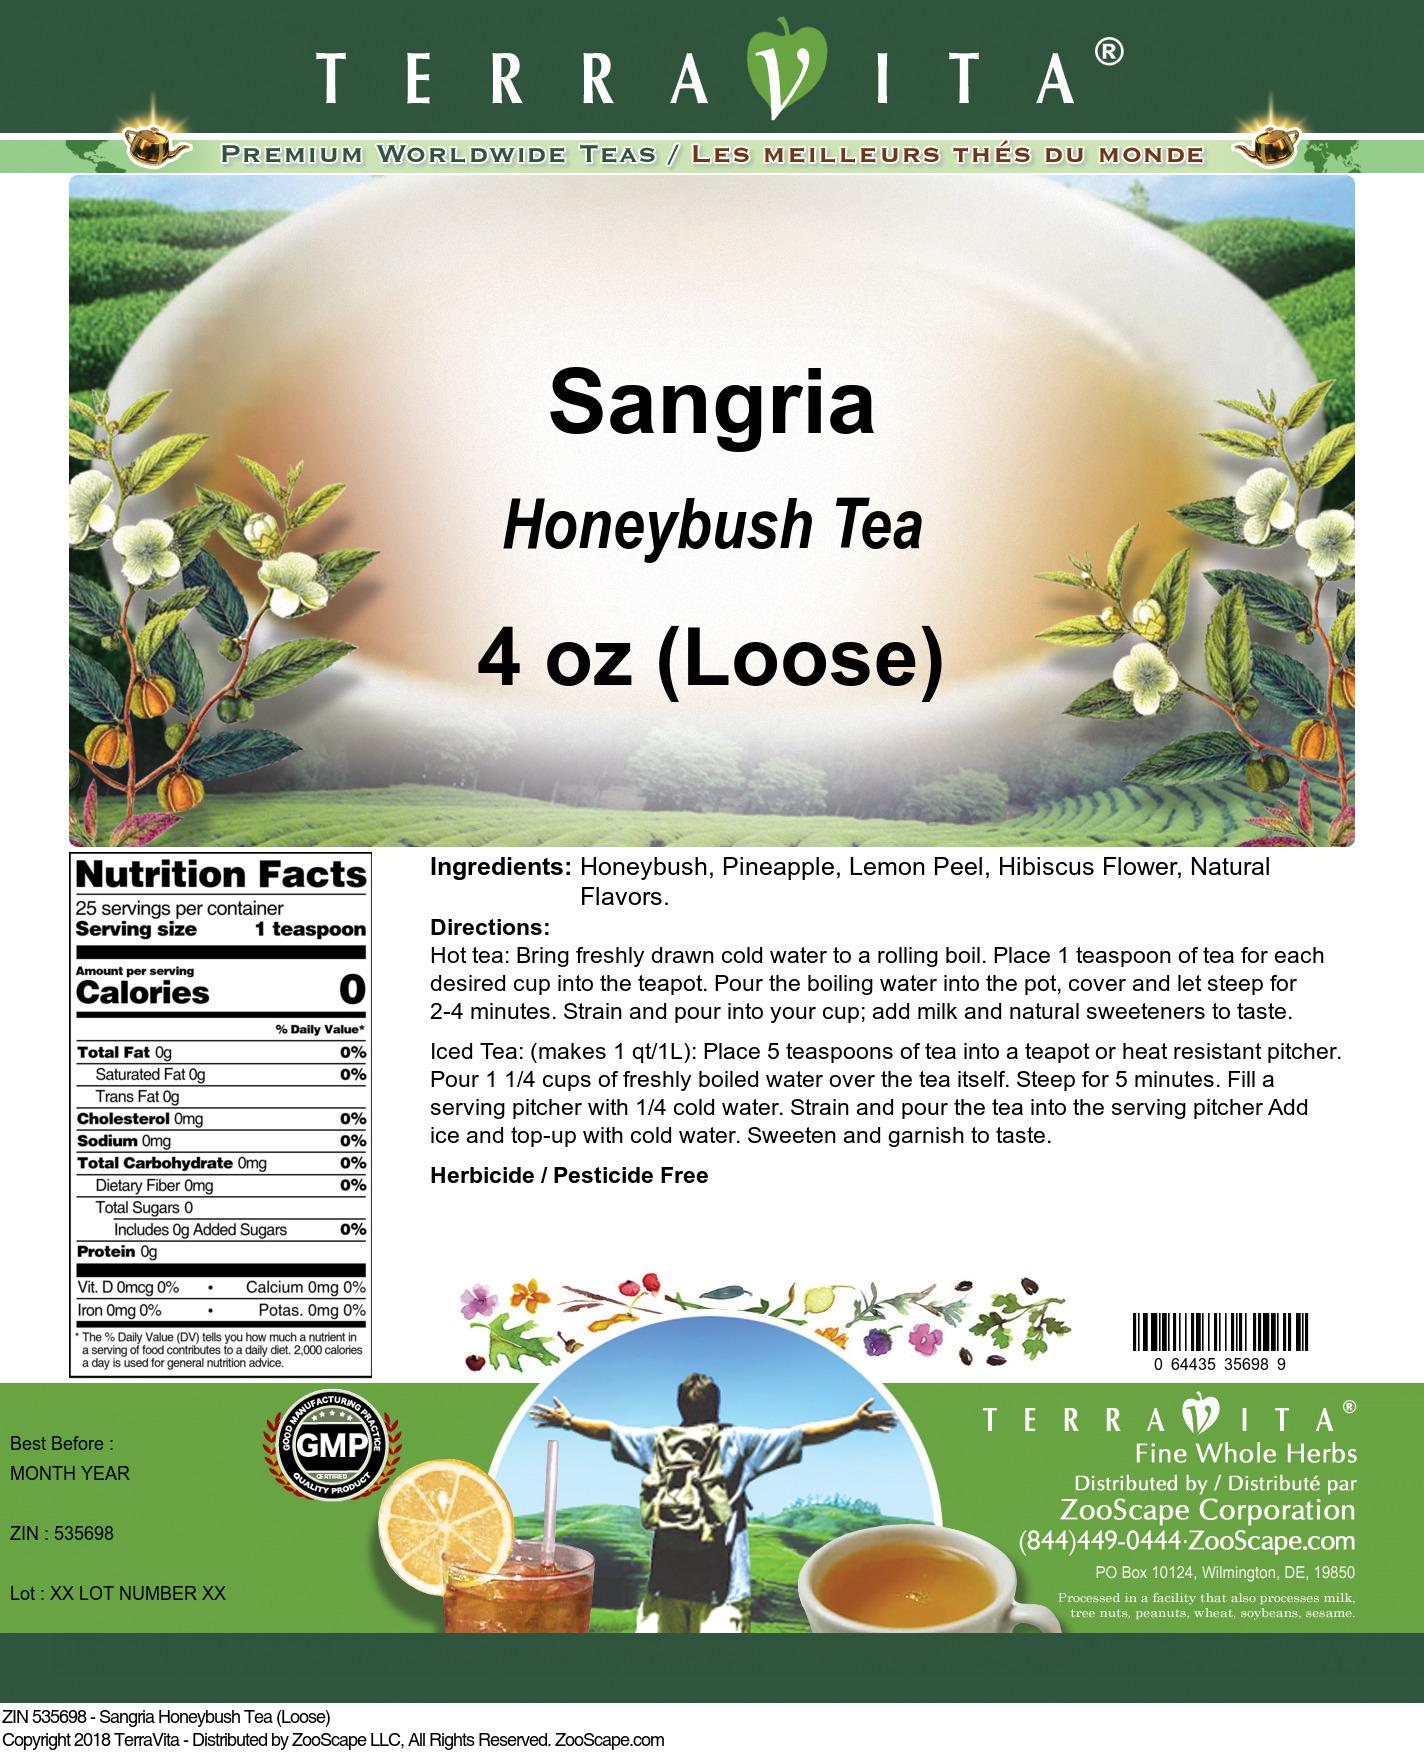 Sangria Honeybush Tea (Loose)